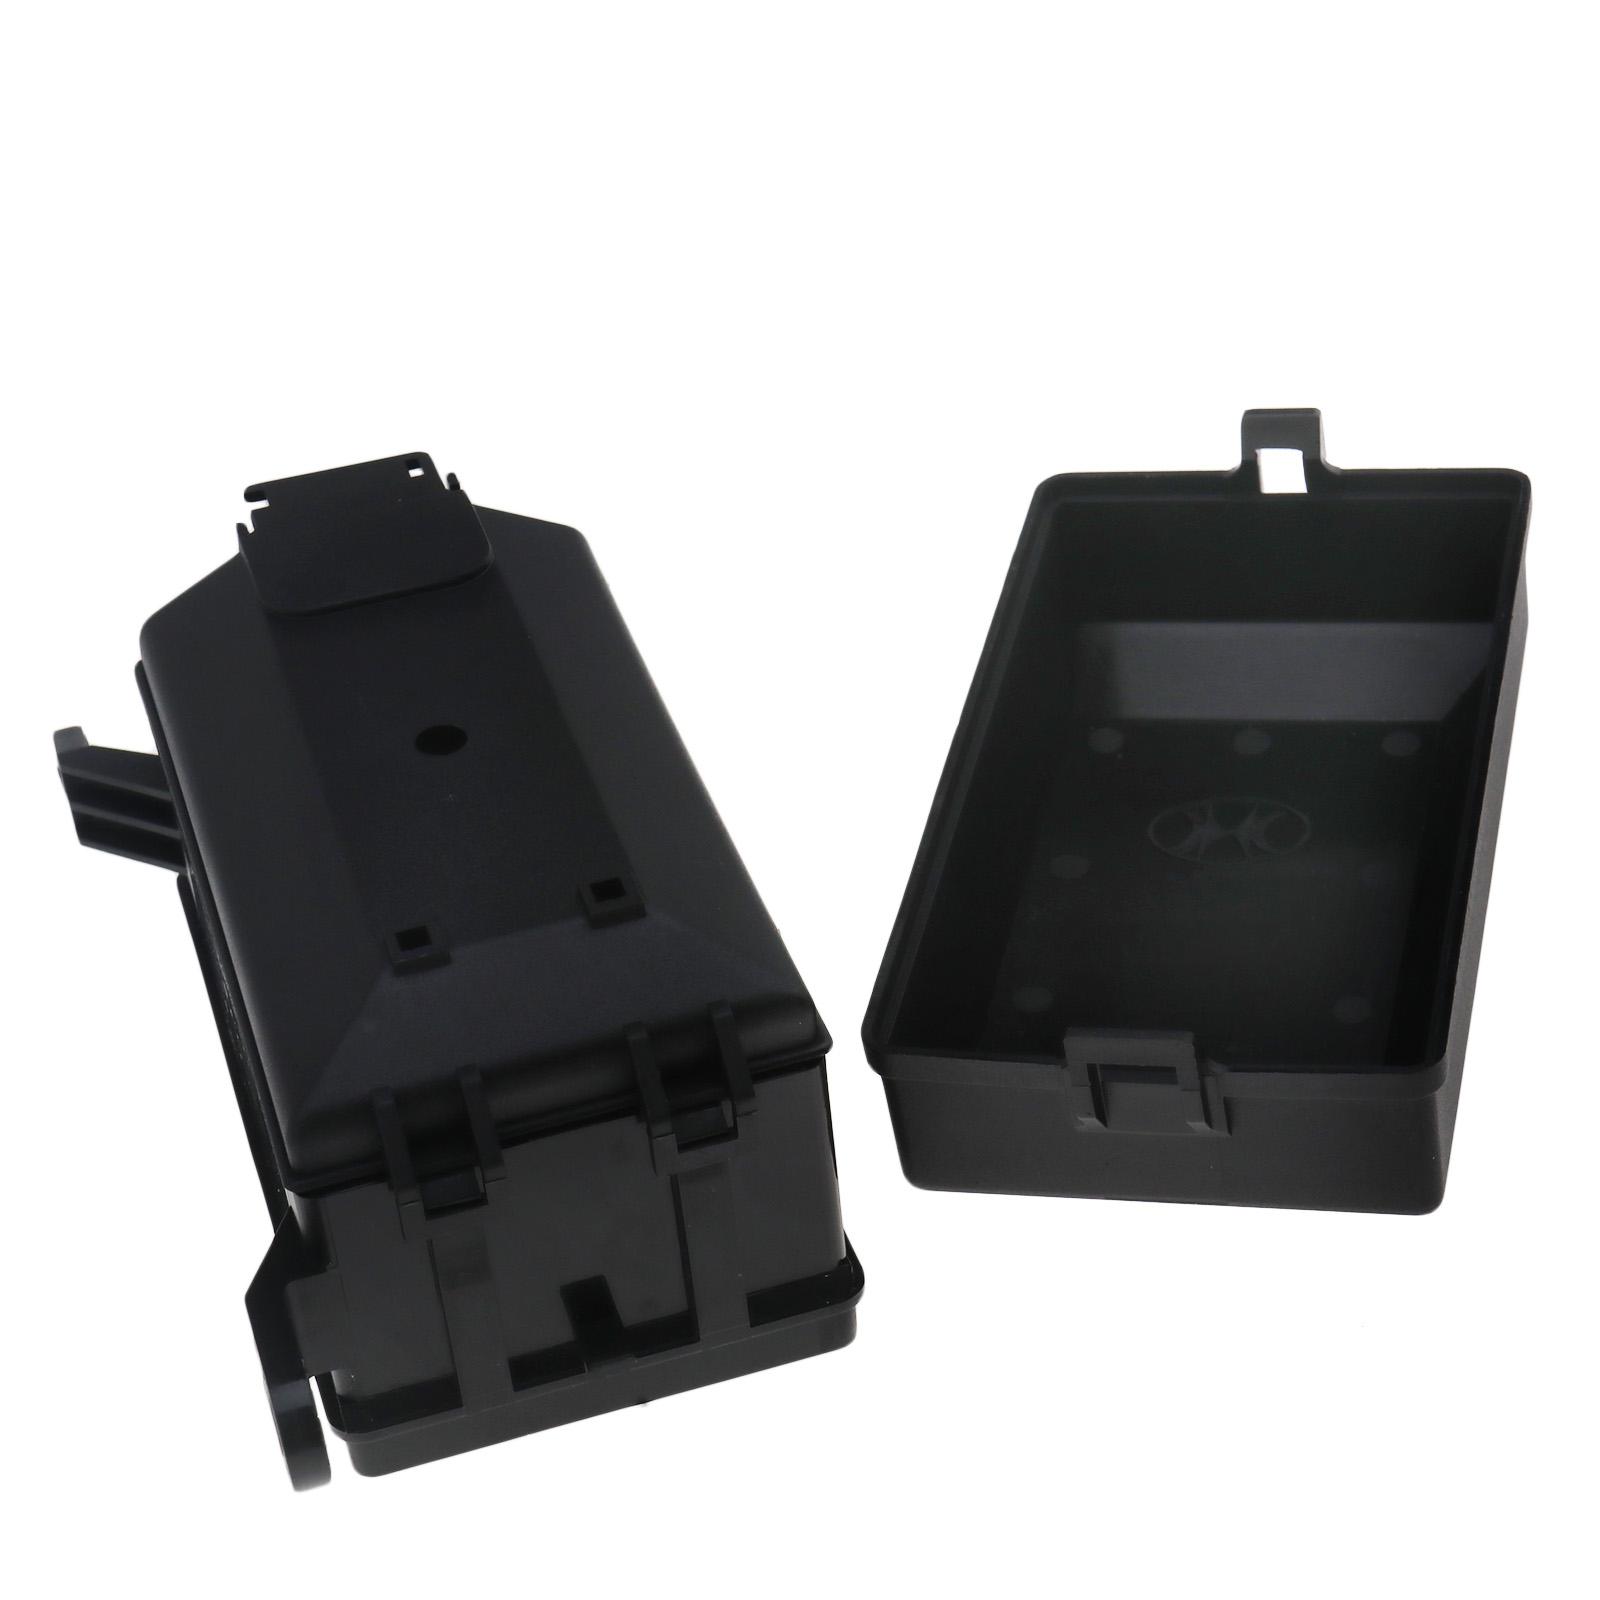 w2 automotive 6 relay block holder 5 road electrical fuse. Black Bedroom Furniture Sets. Home Design Ideas